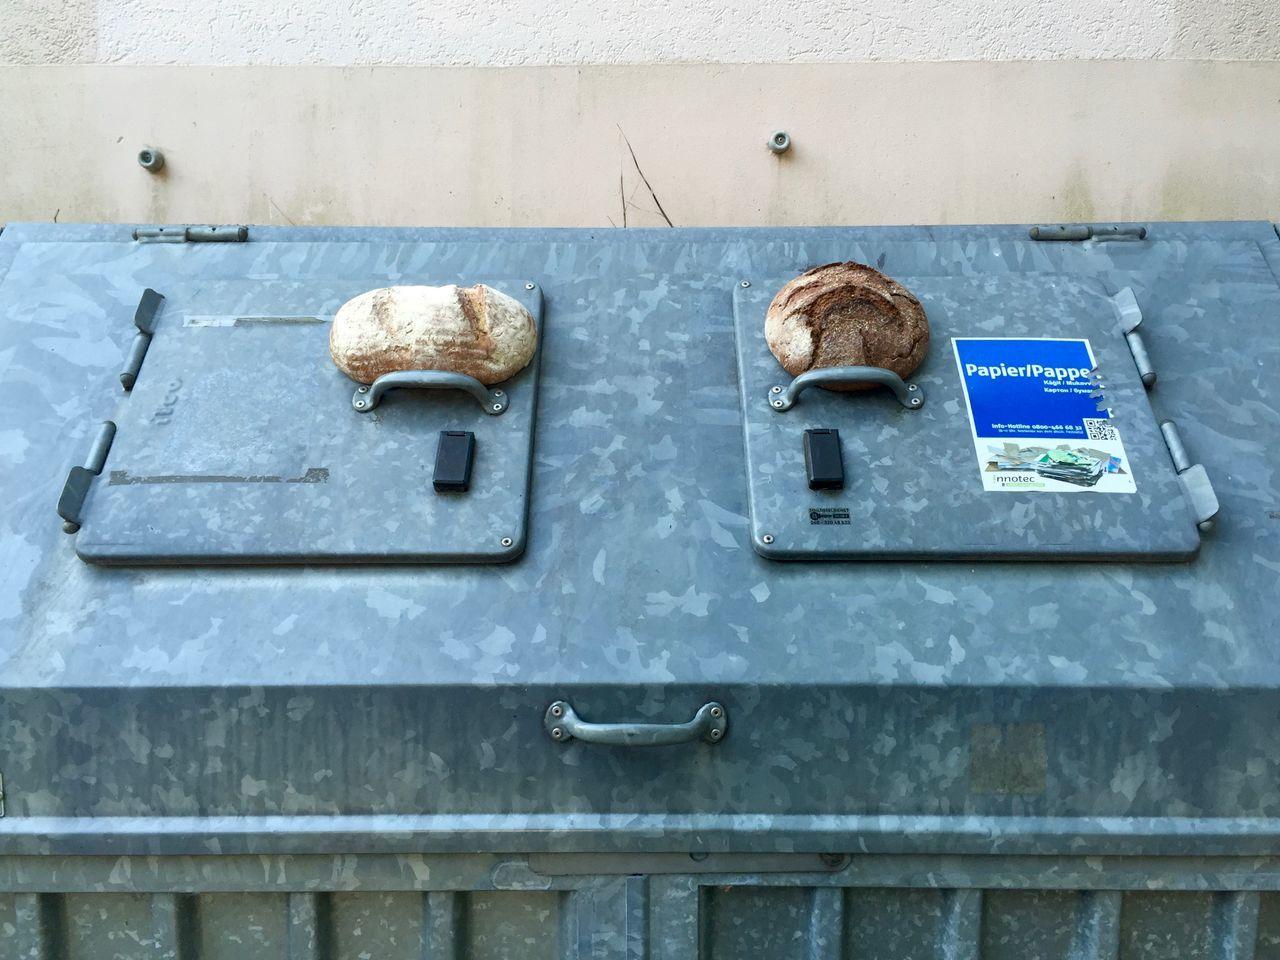 Brot für die Tonne Bread Brot Brotausgabe Hunger Müll Nahrungsmittel Verschwendung Wegwerfgesellschaft überfluss